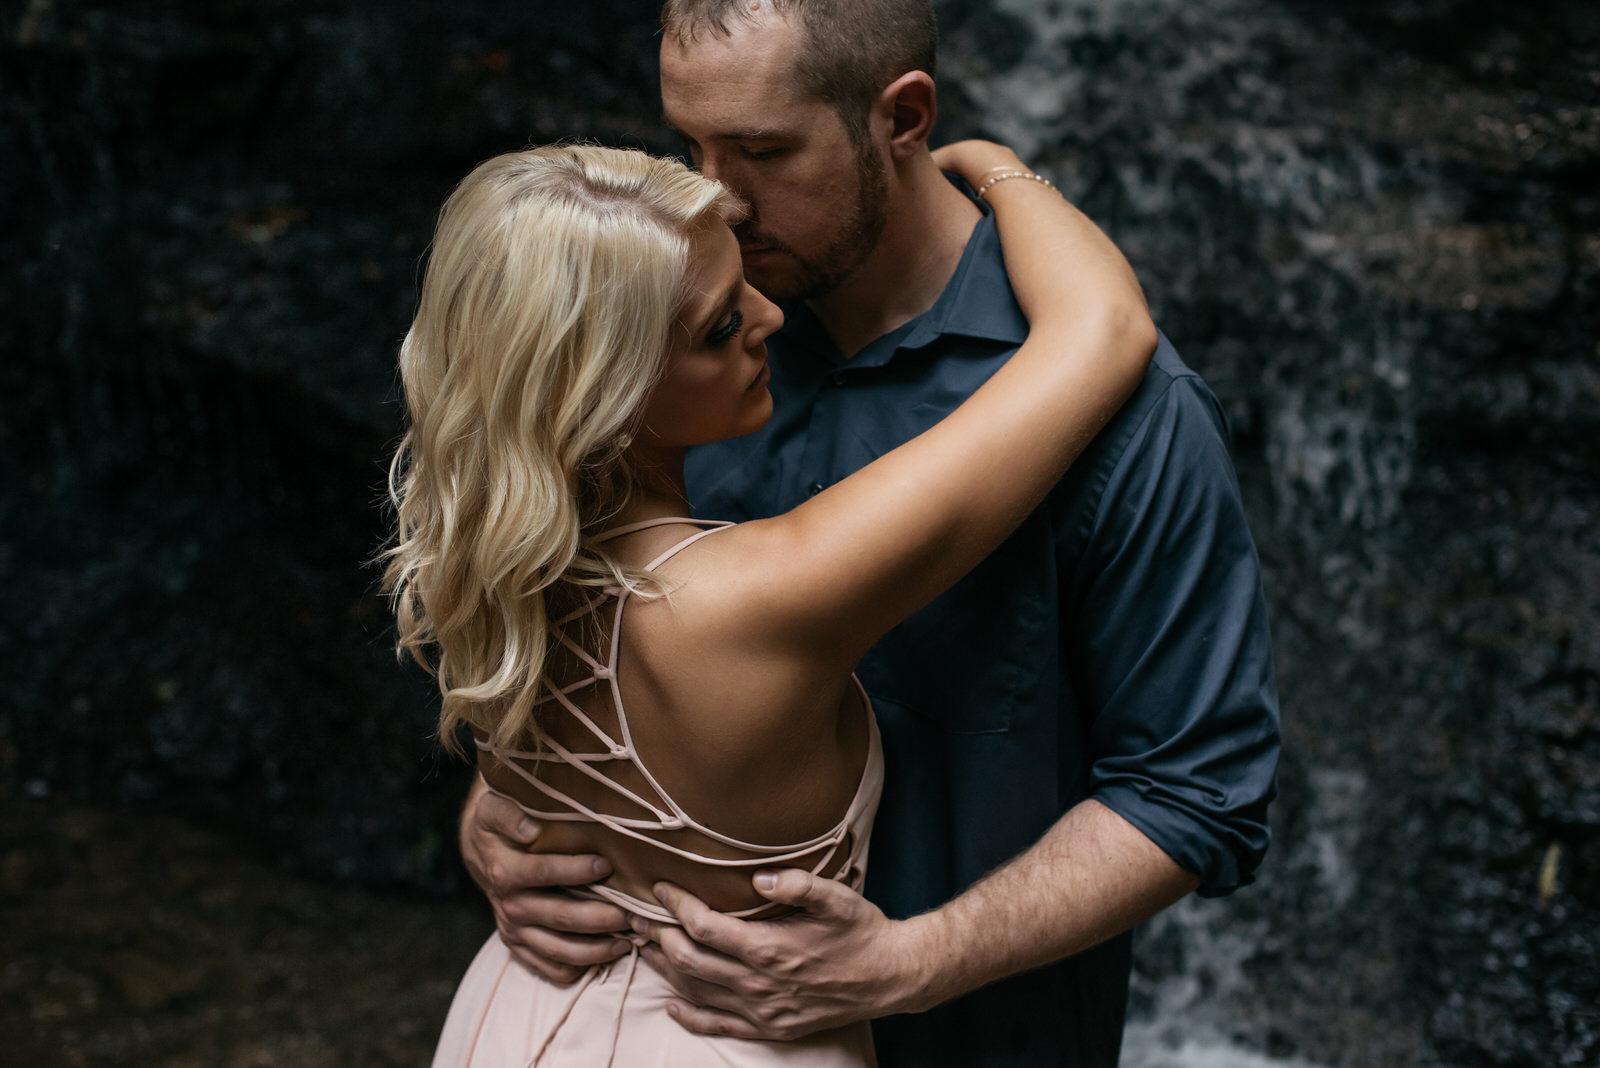 McConnells-Mill-Engagement-Photos-15.jpg